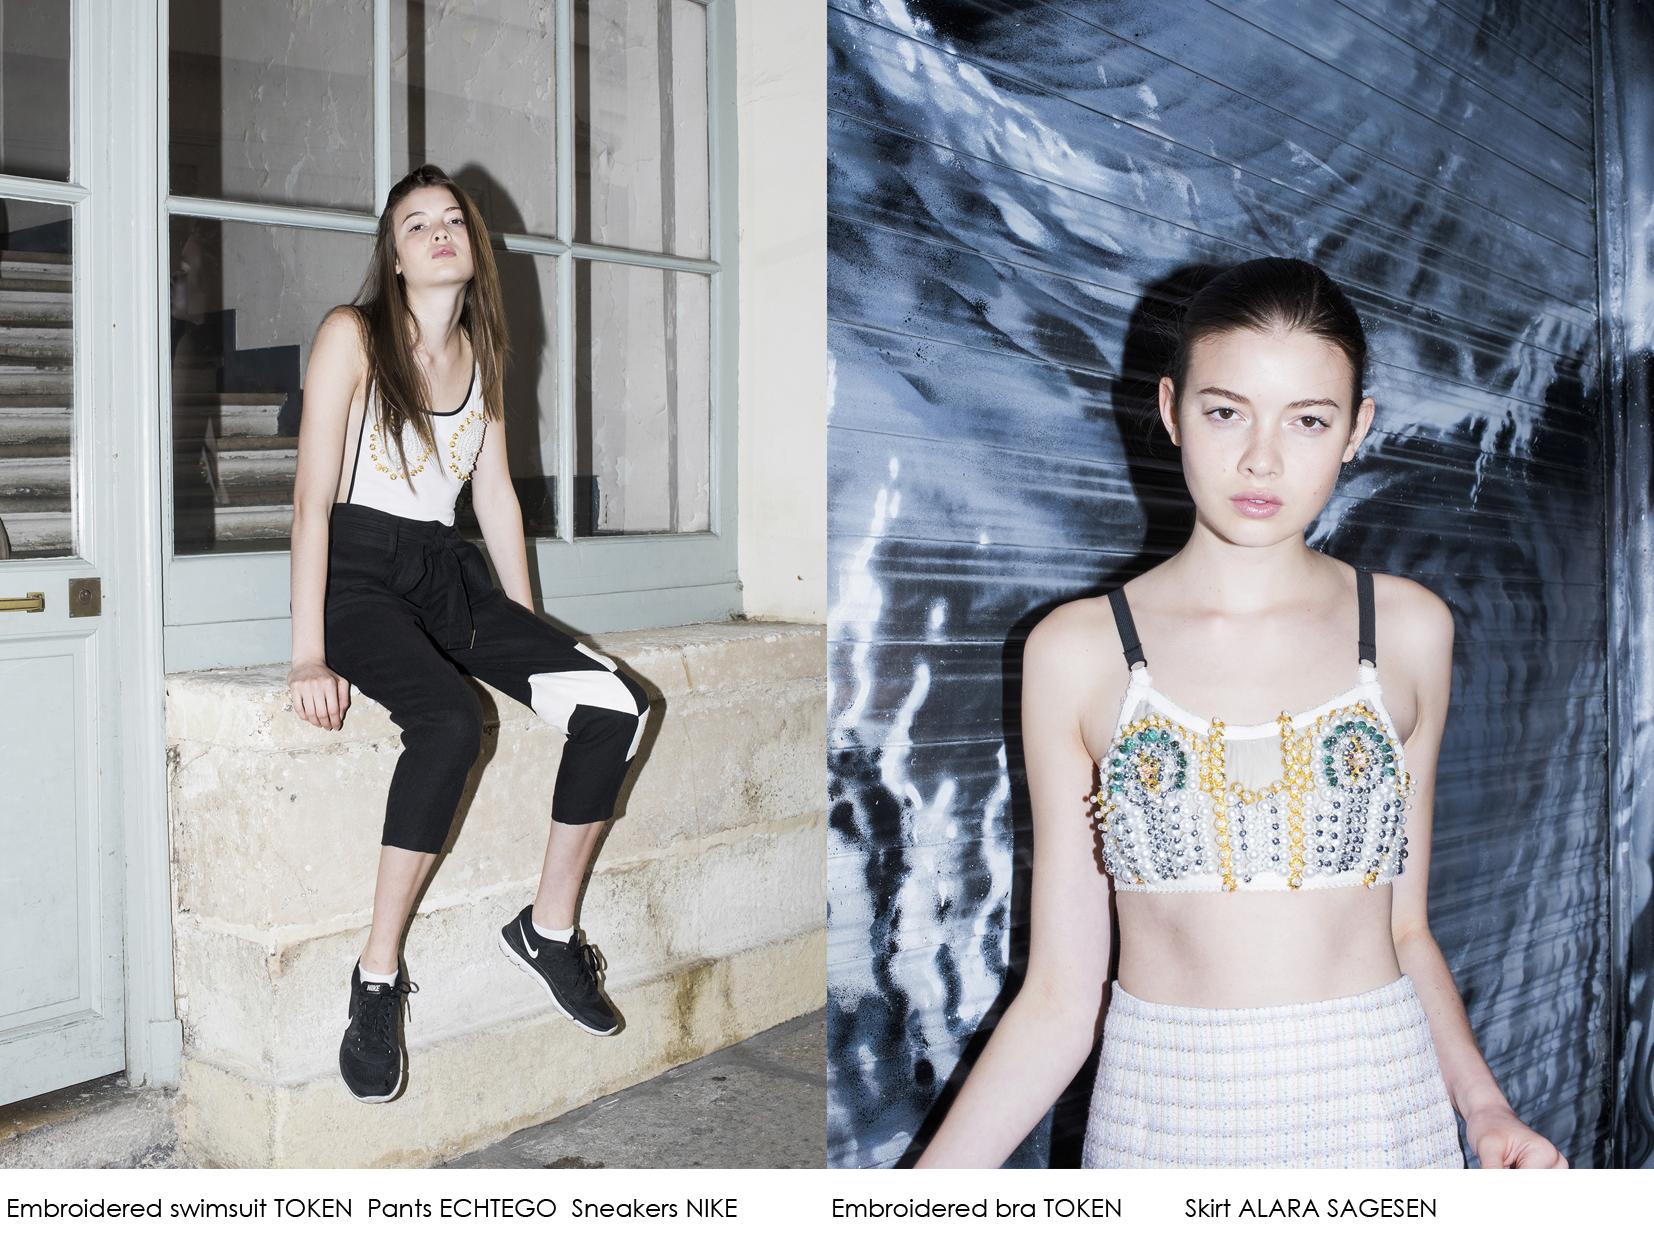 token-paris-beutail_emma-burlet_juste-magazine-1